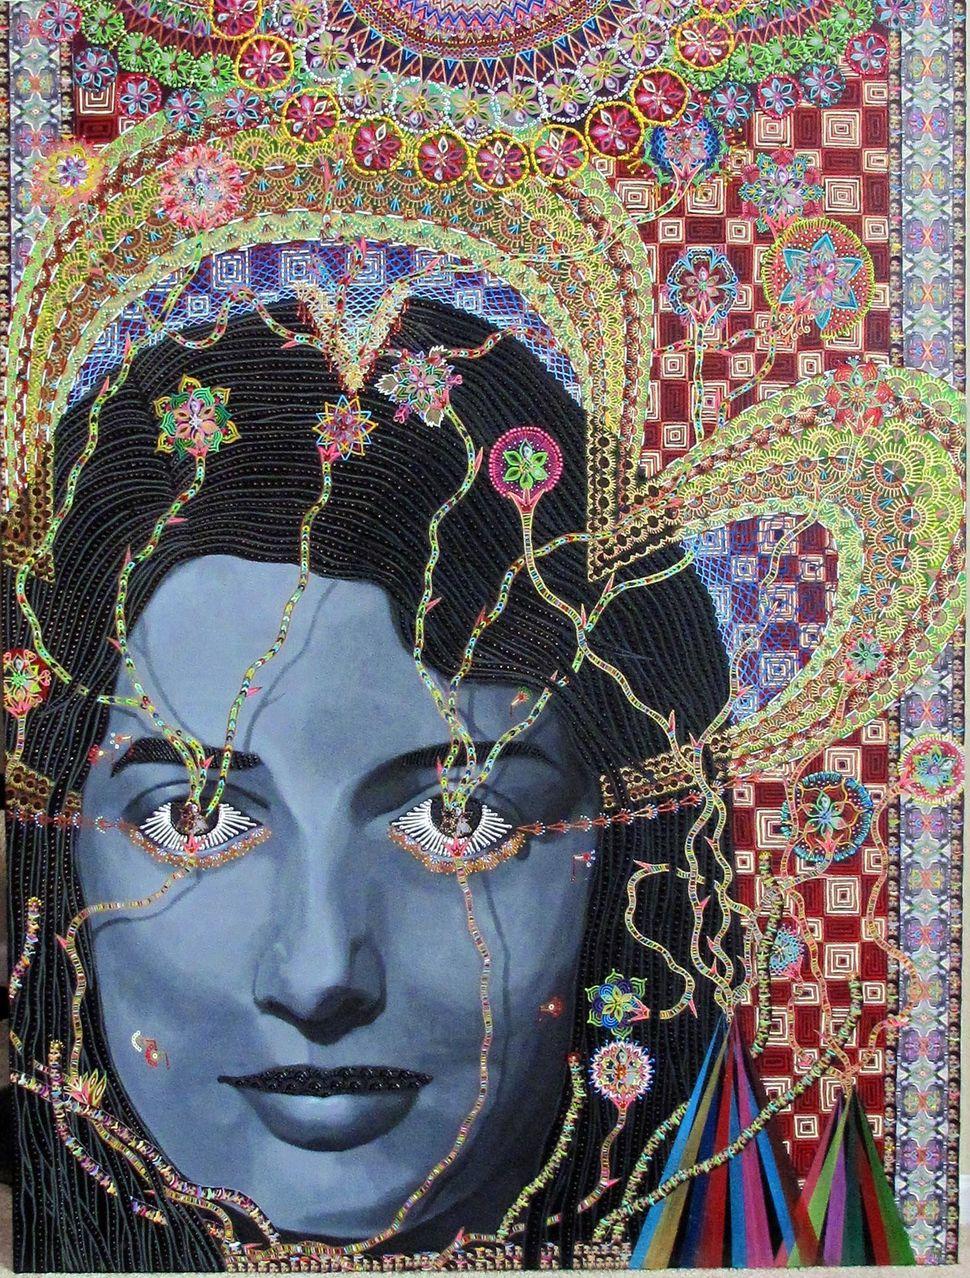 Les femmes D'Alger #14, 48x36 inches, 2011